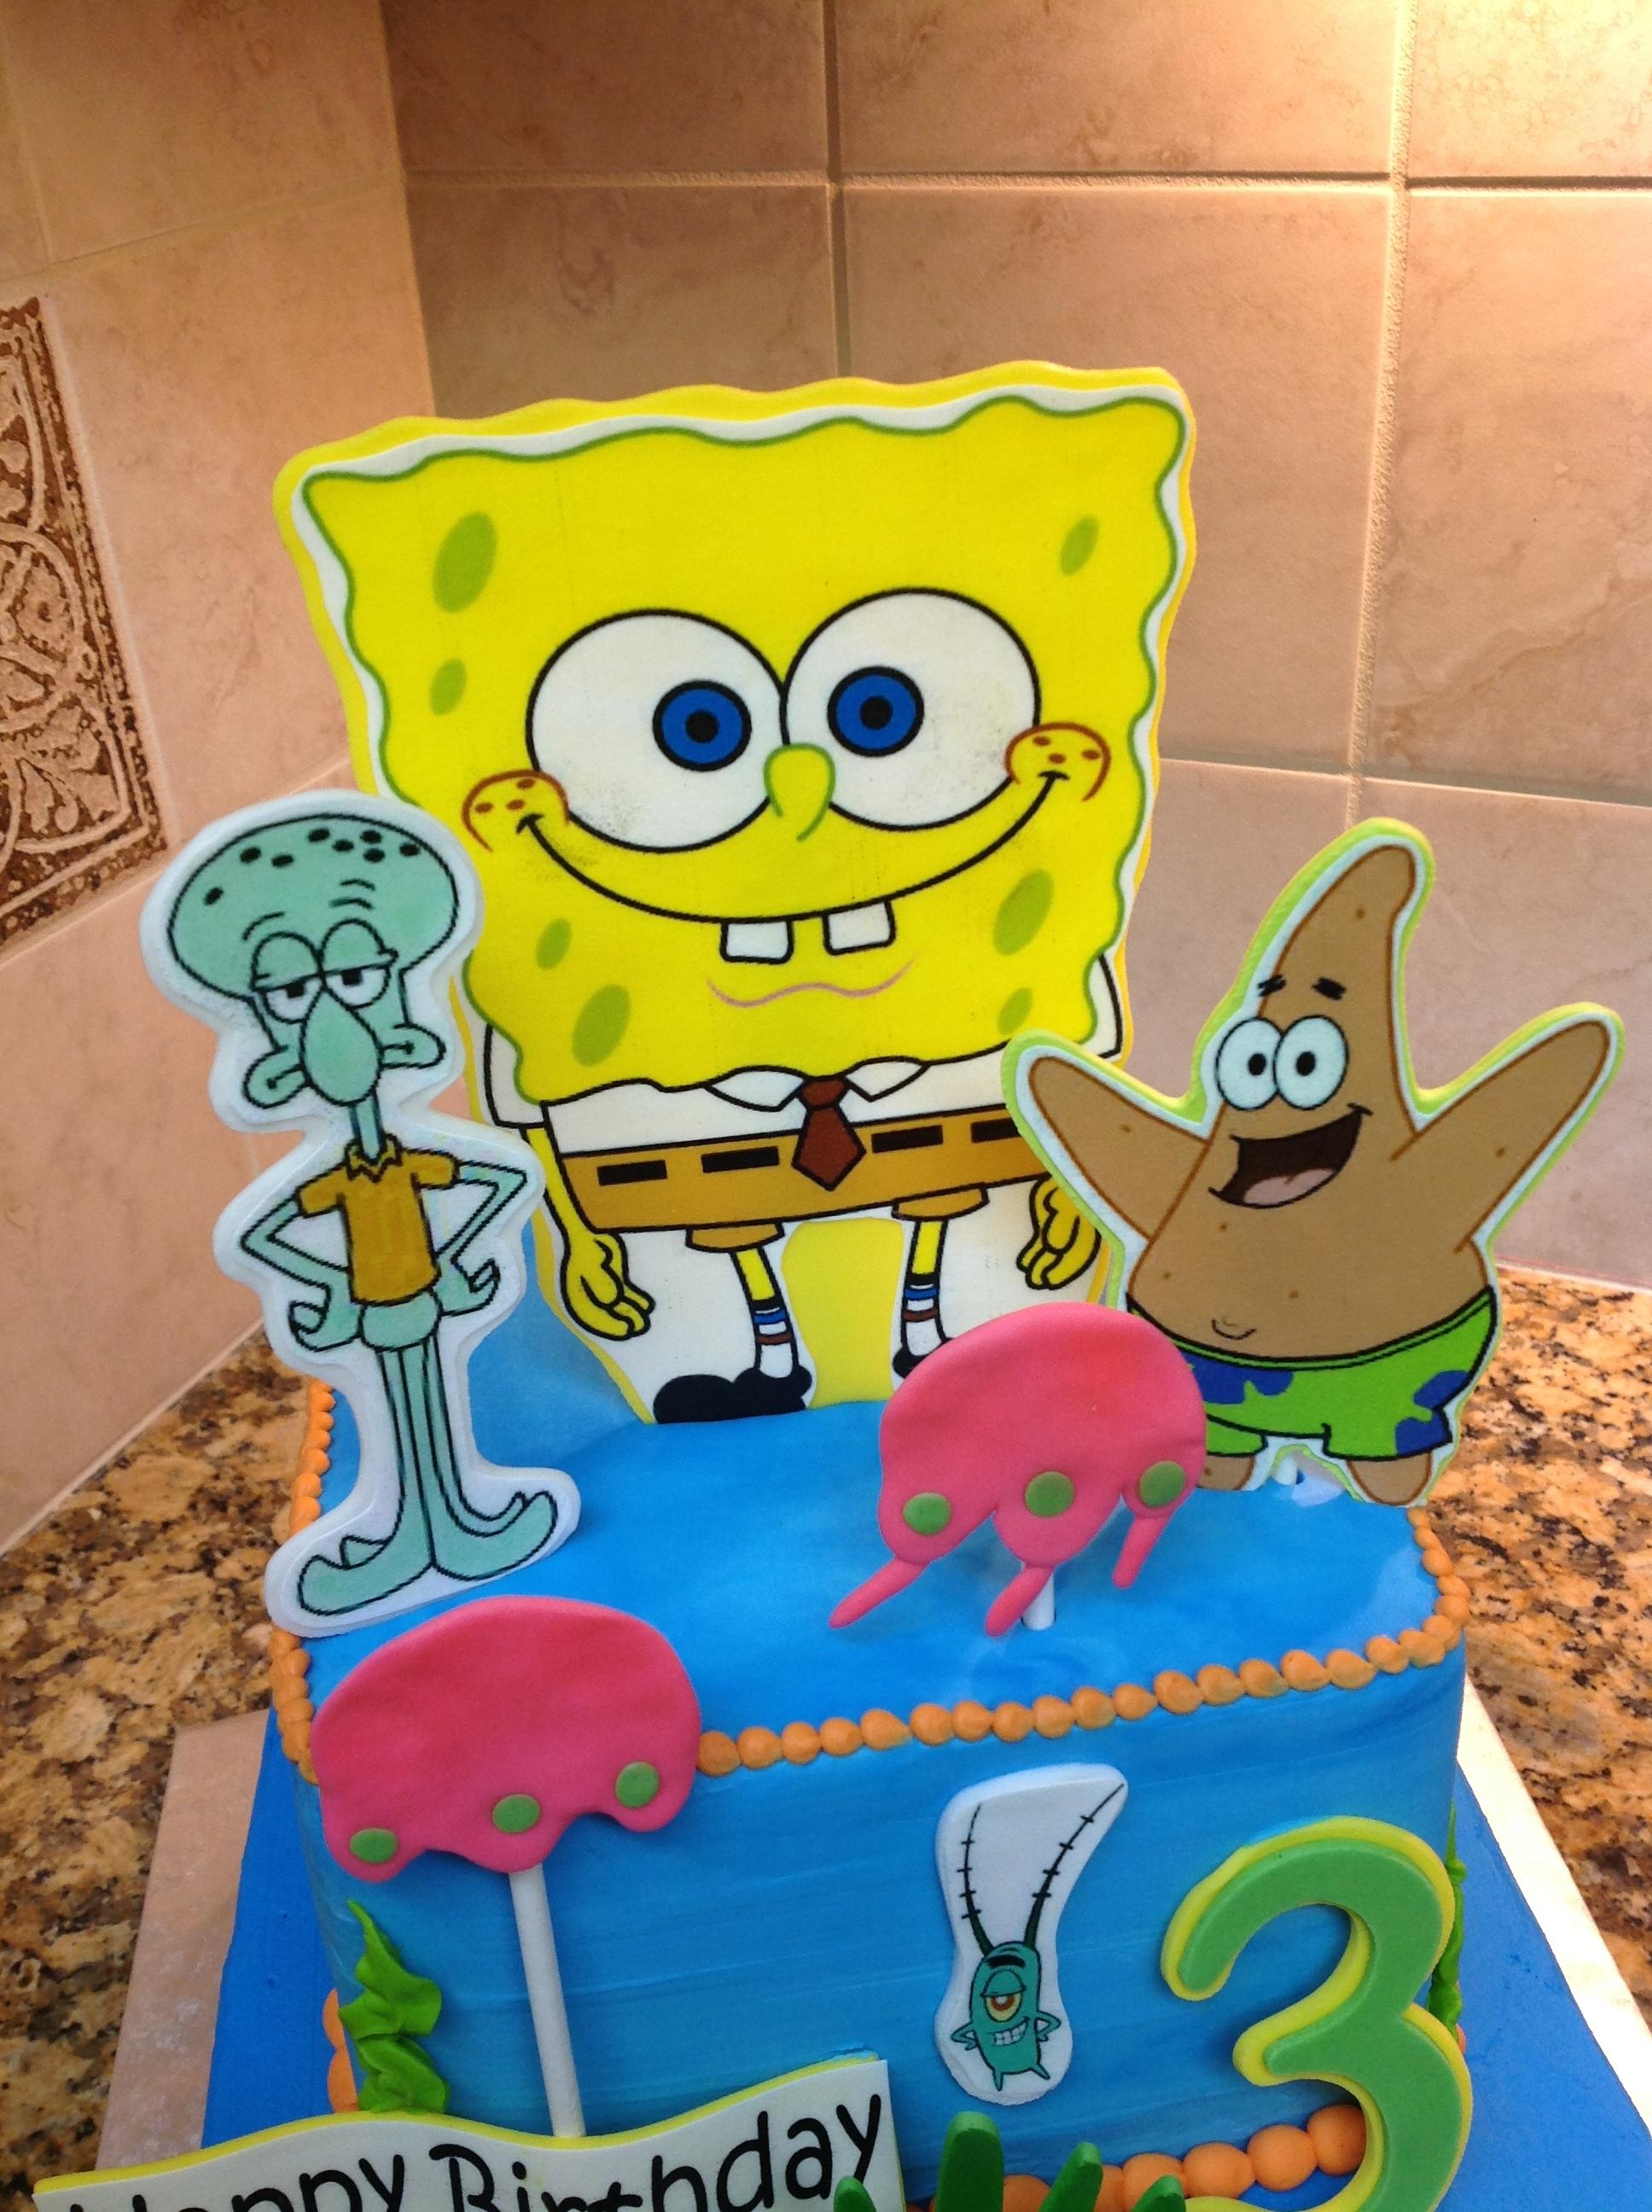 Spongebob Squarepants Character Cake - CakeCentral.com